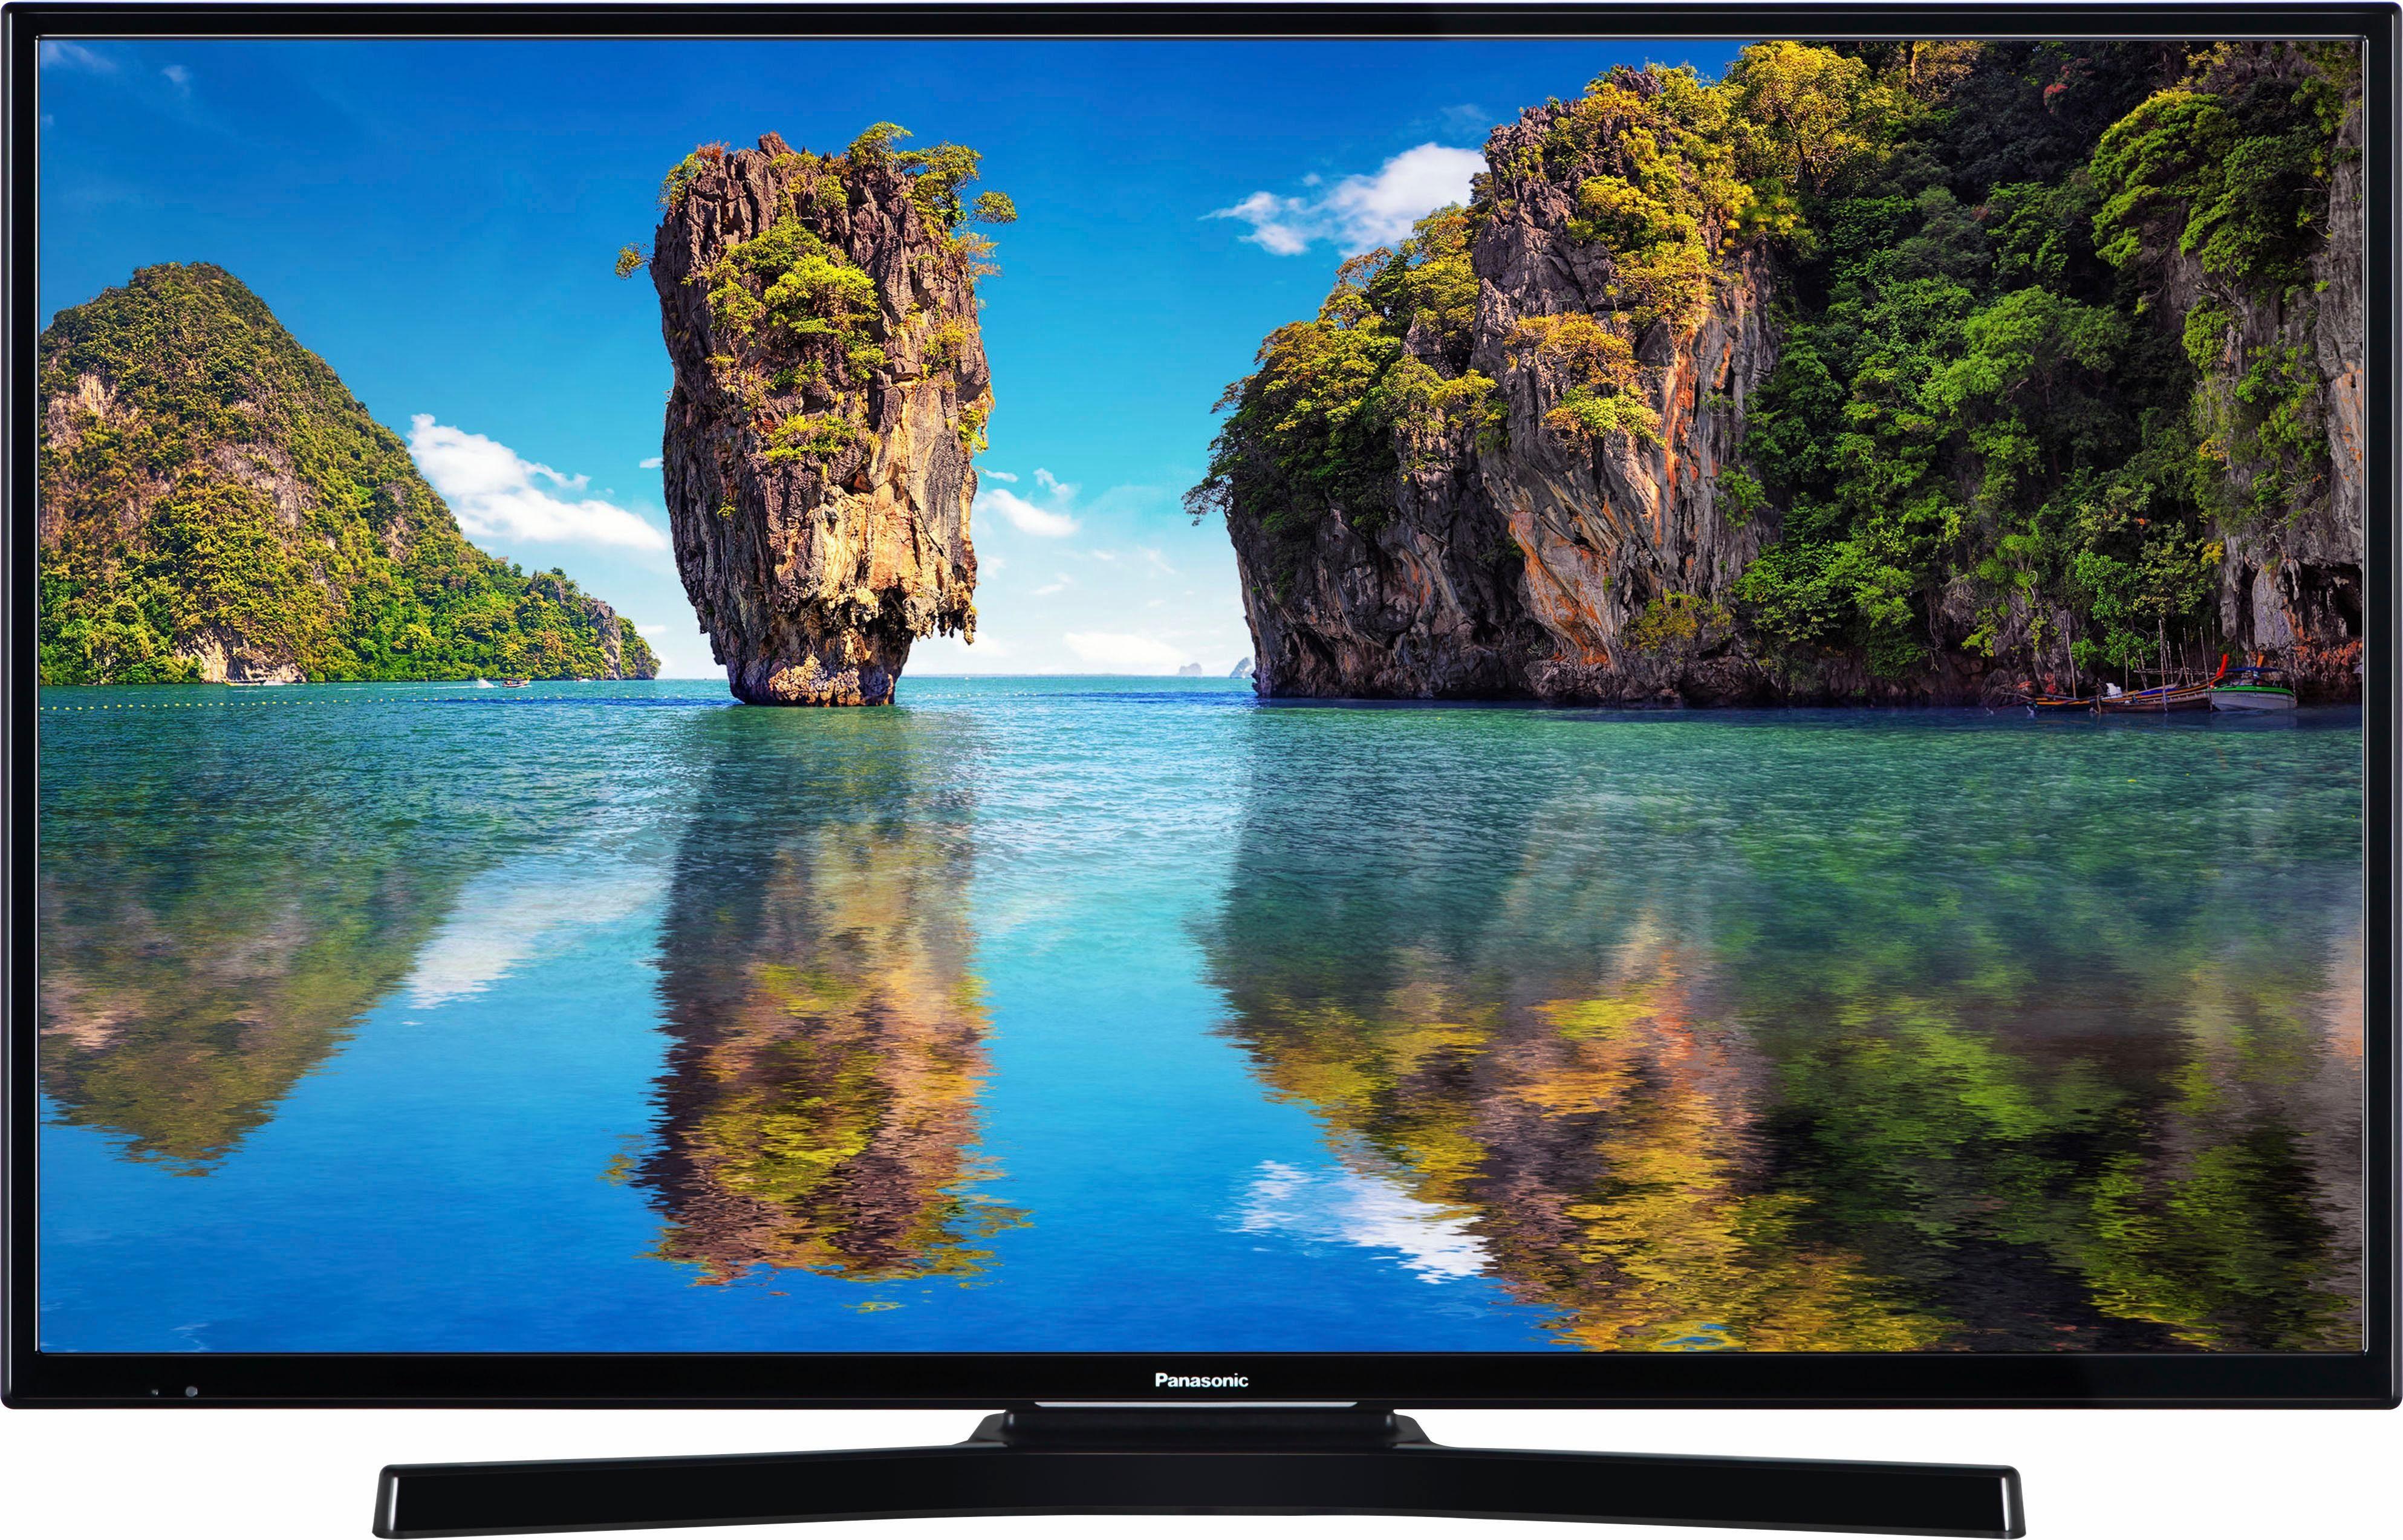 Panasonic TX-39EW334 LED-Fernseher (98 cm/39 Zoll, Full HD)